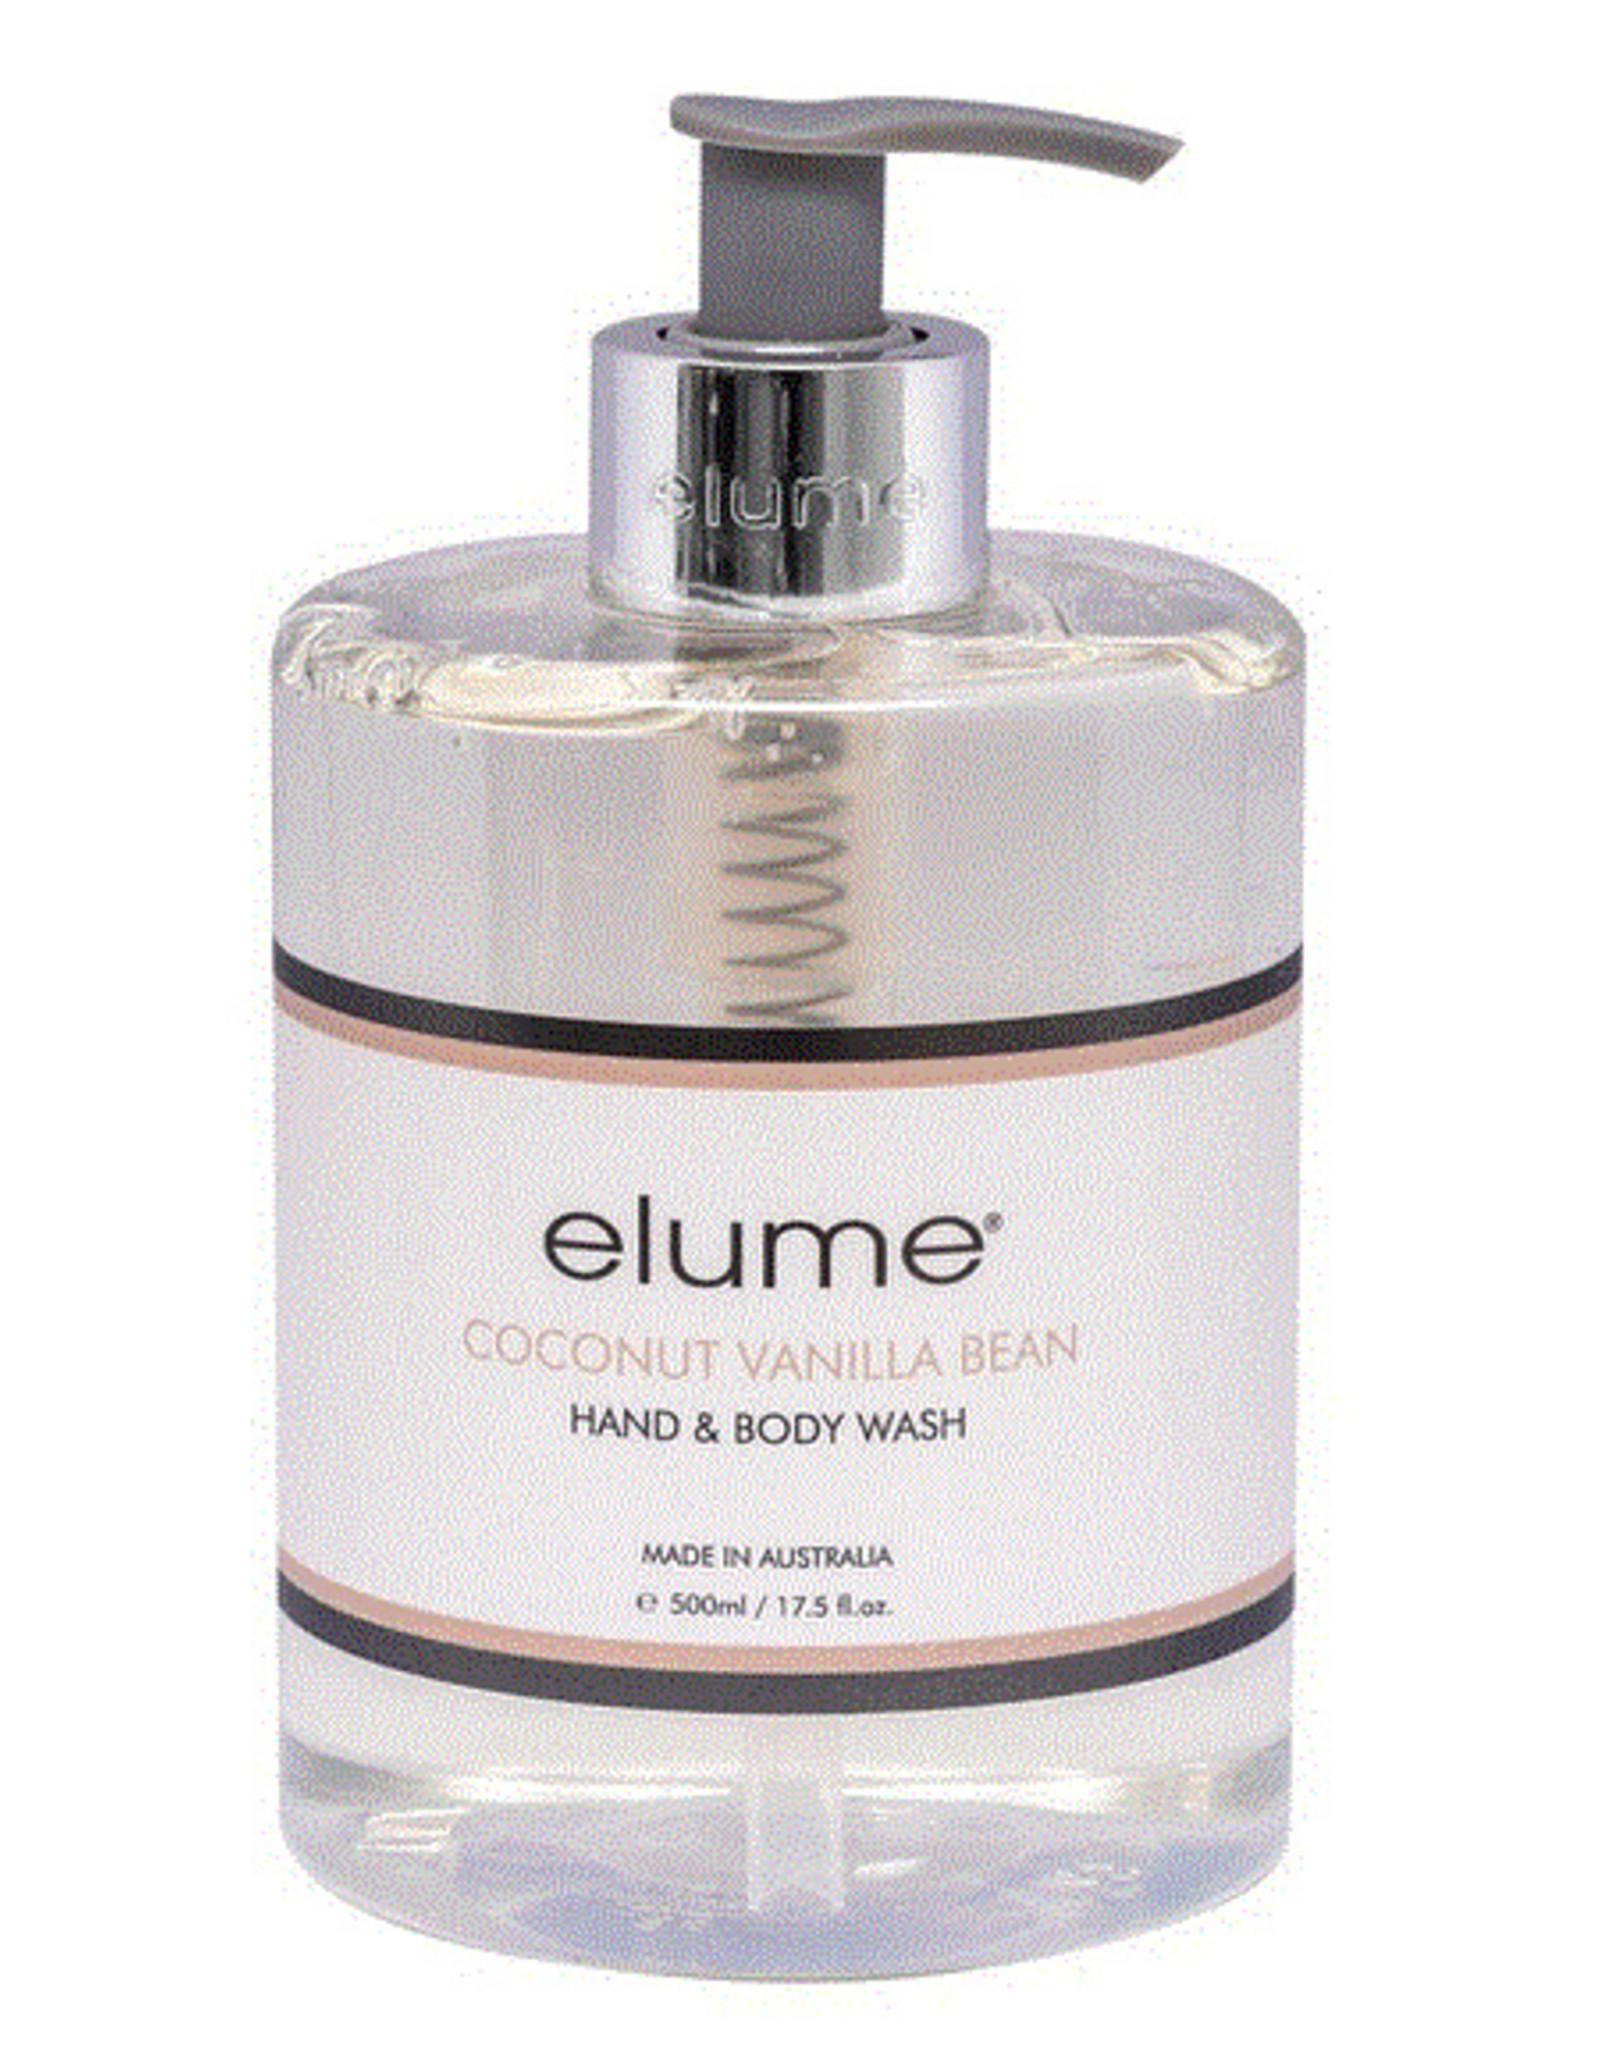 Elume Elume Hand & Body Wash 500ml